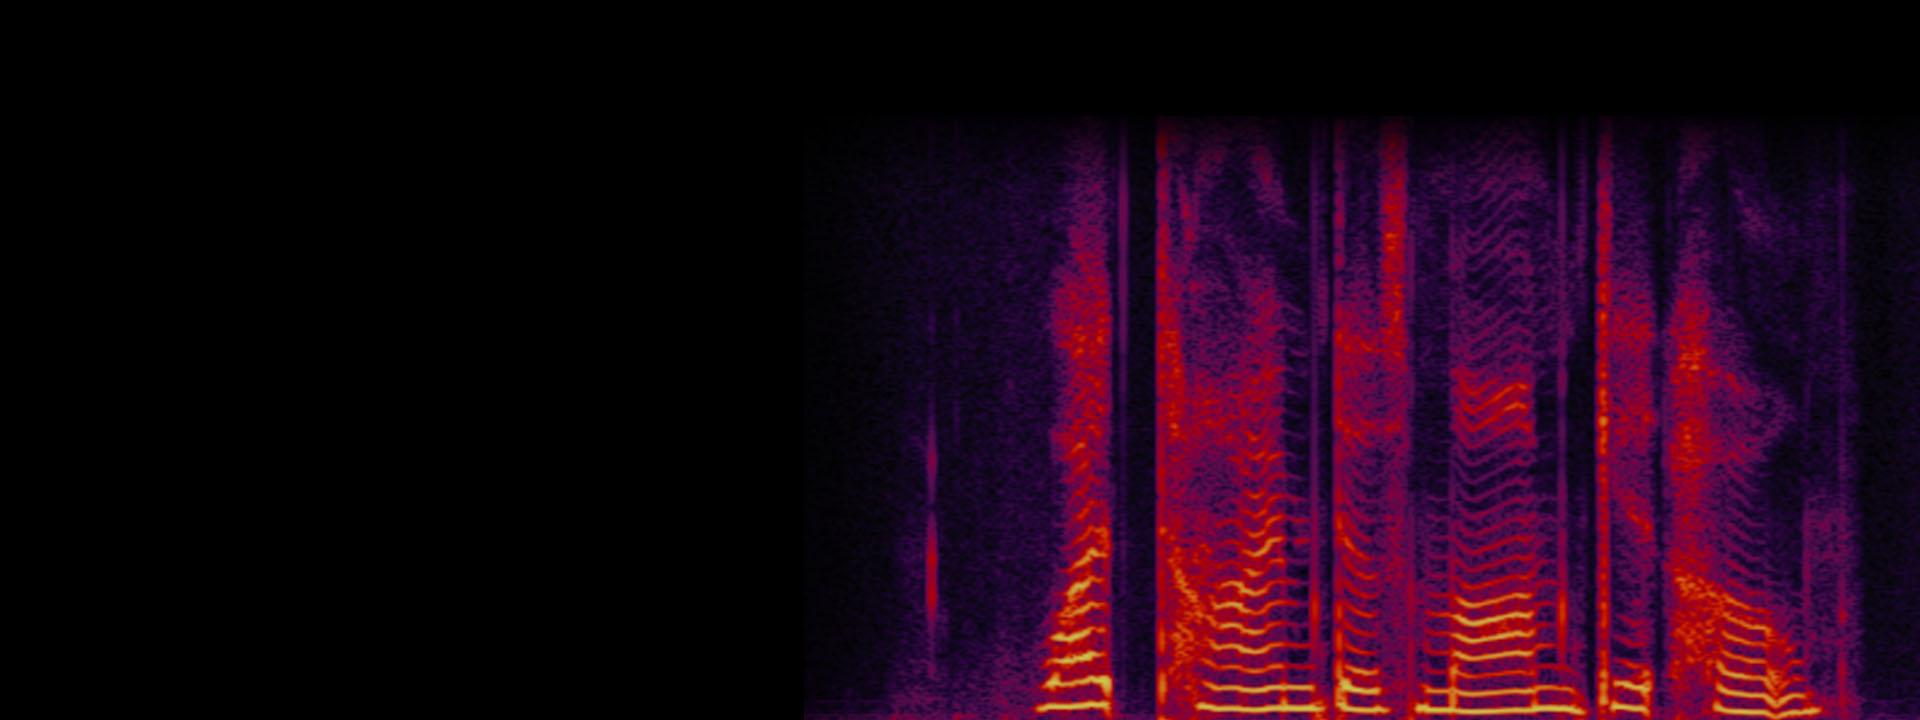 Neural Networks-based Speech Enhancement: sound waves